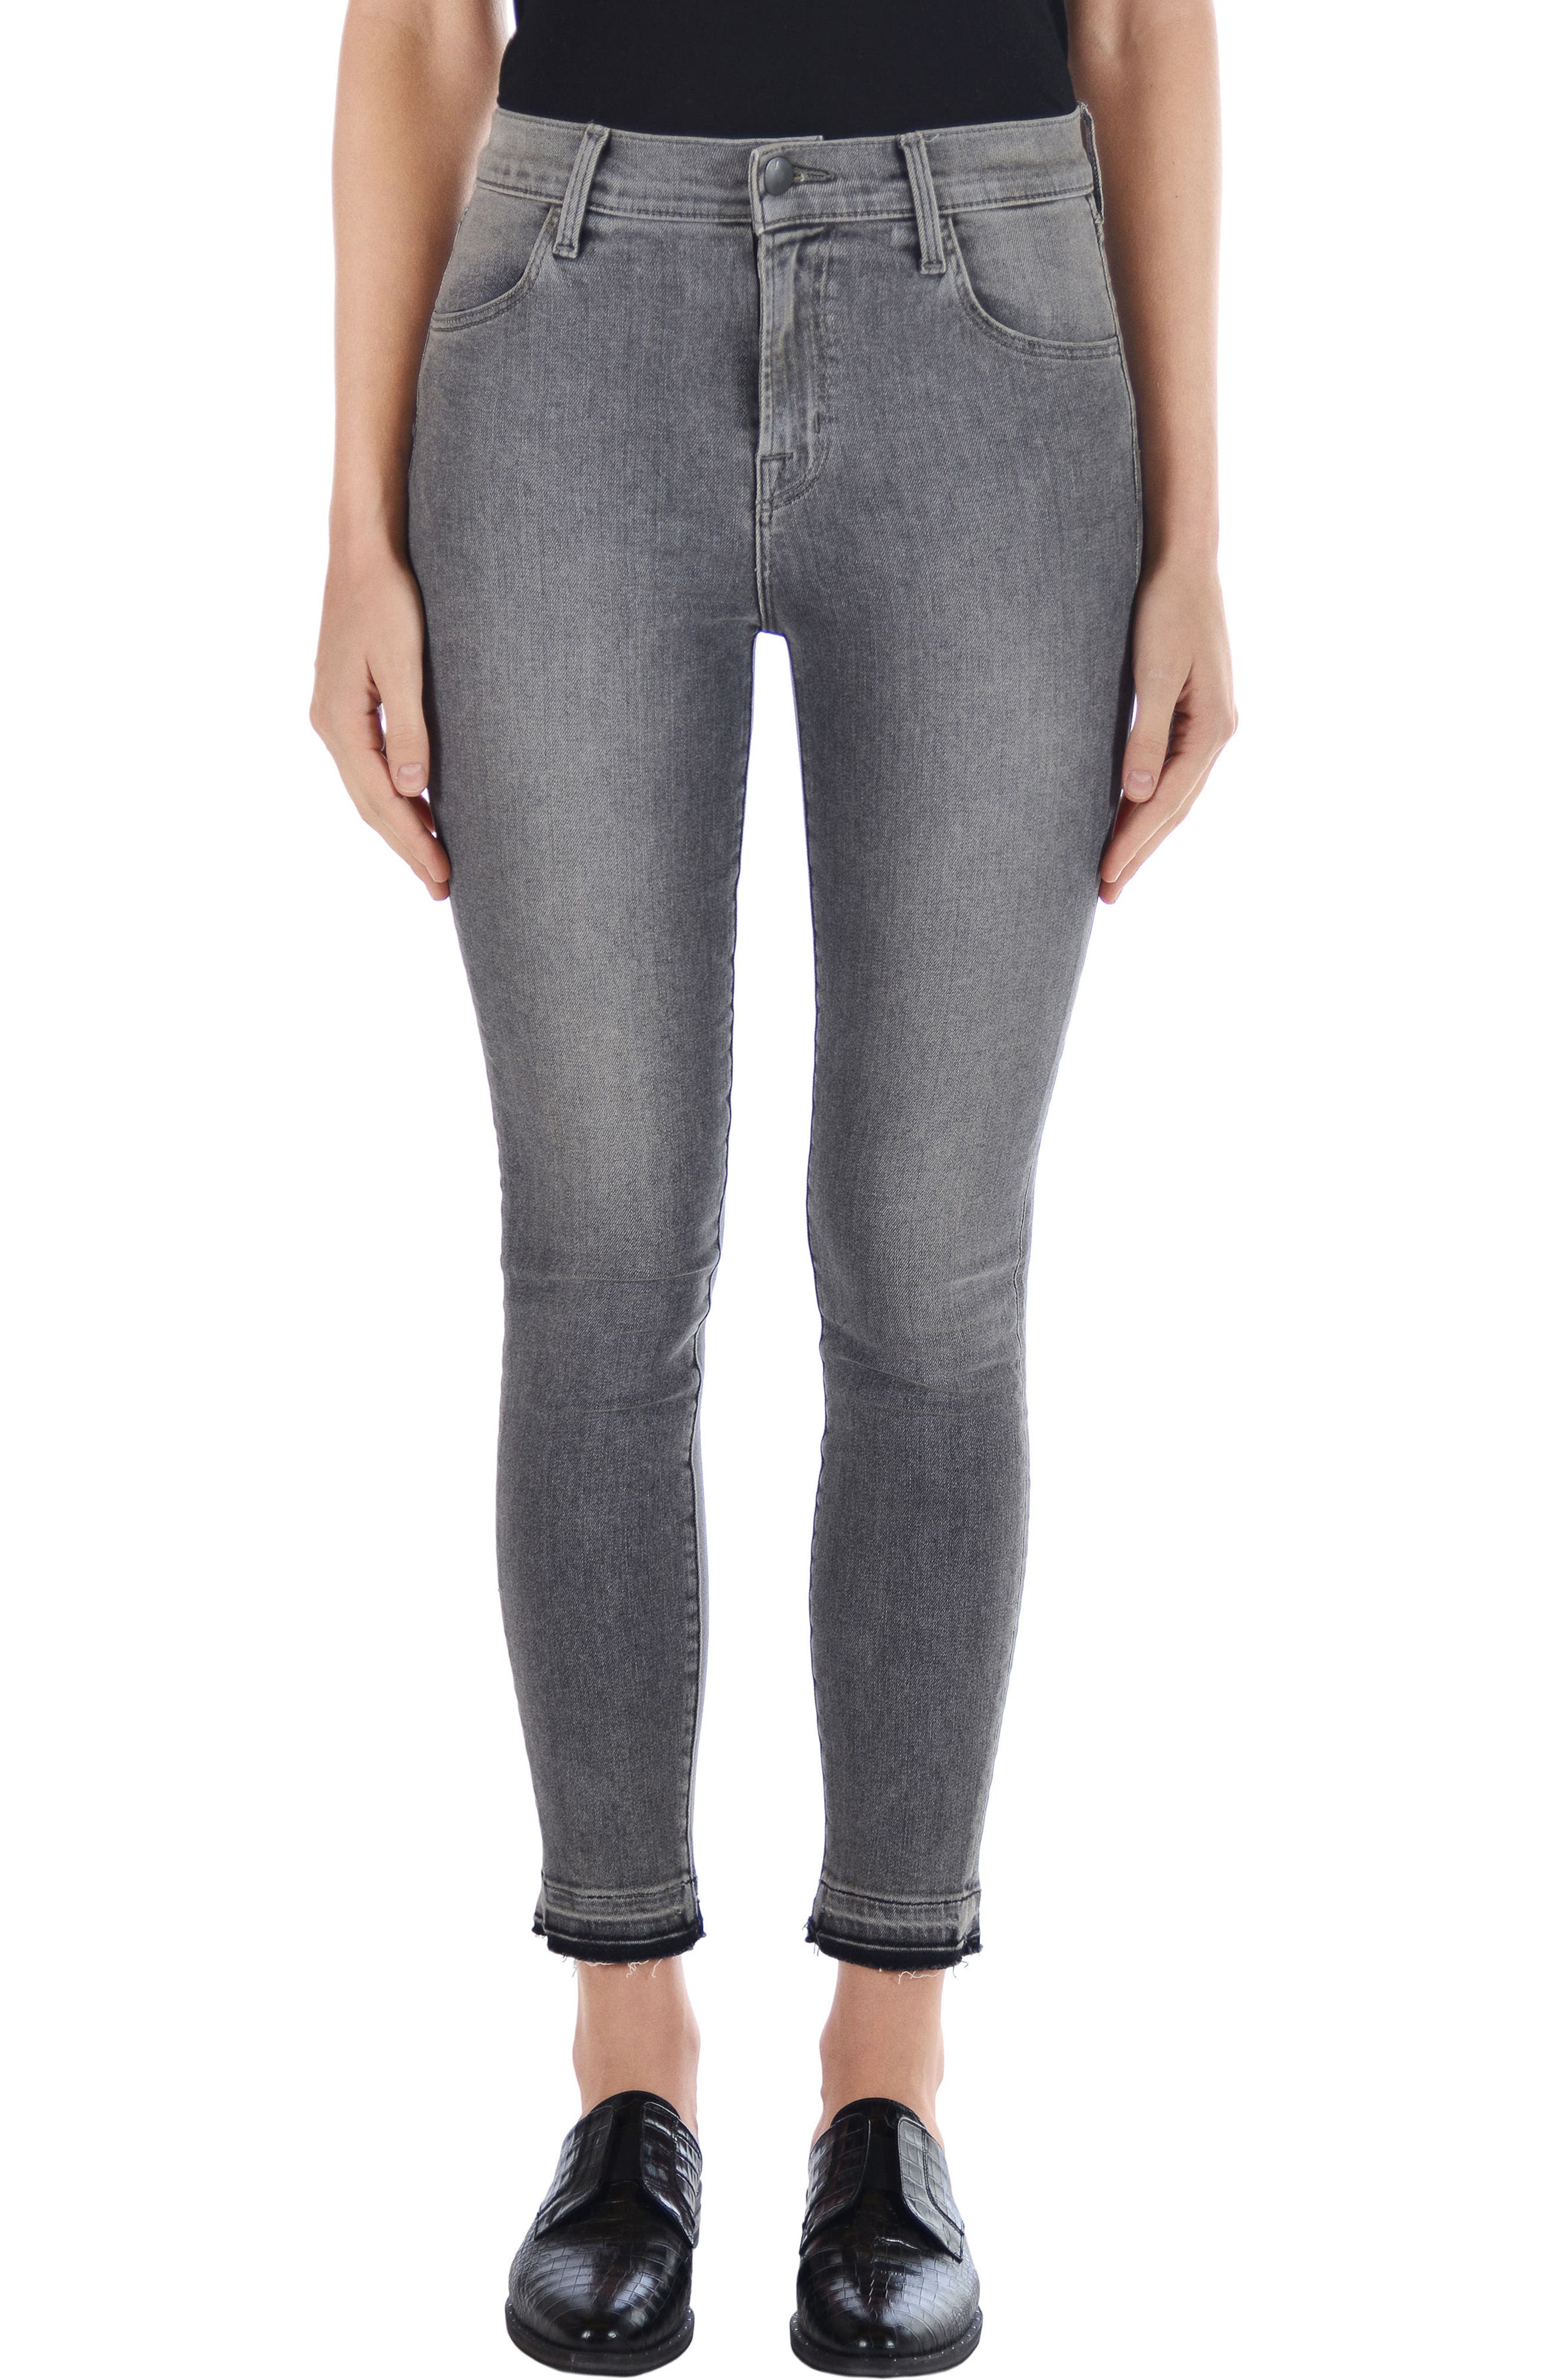 J Brand Alana High Waist Ankle Skinny Jeans (Earl Grey)